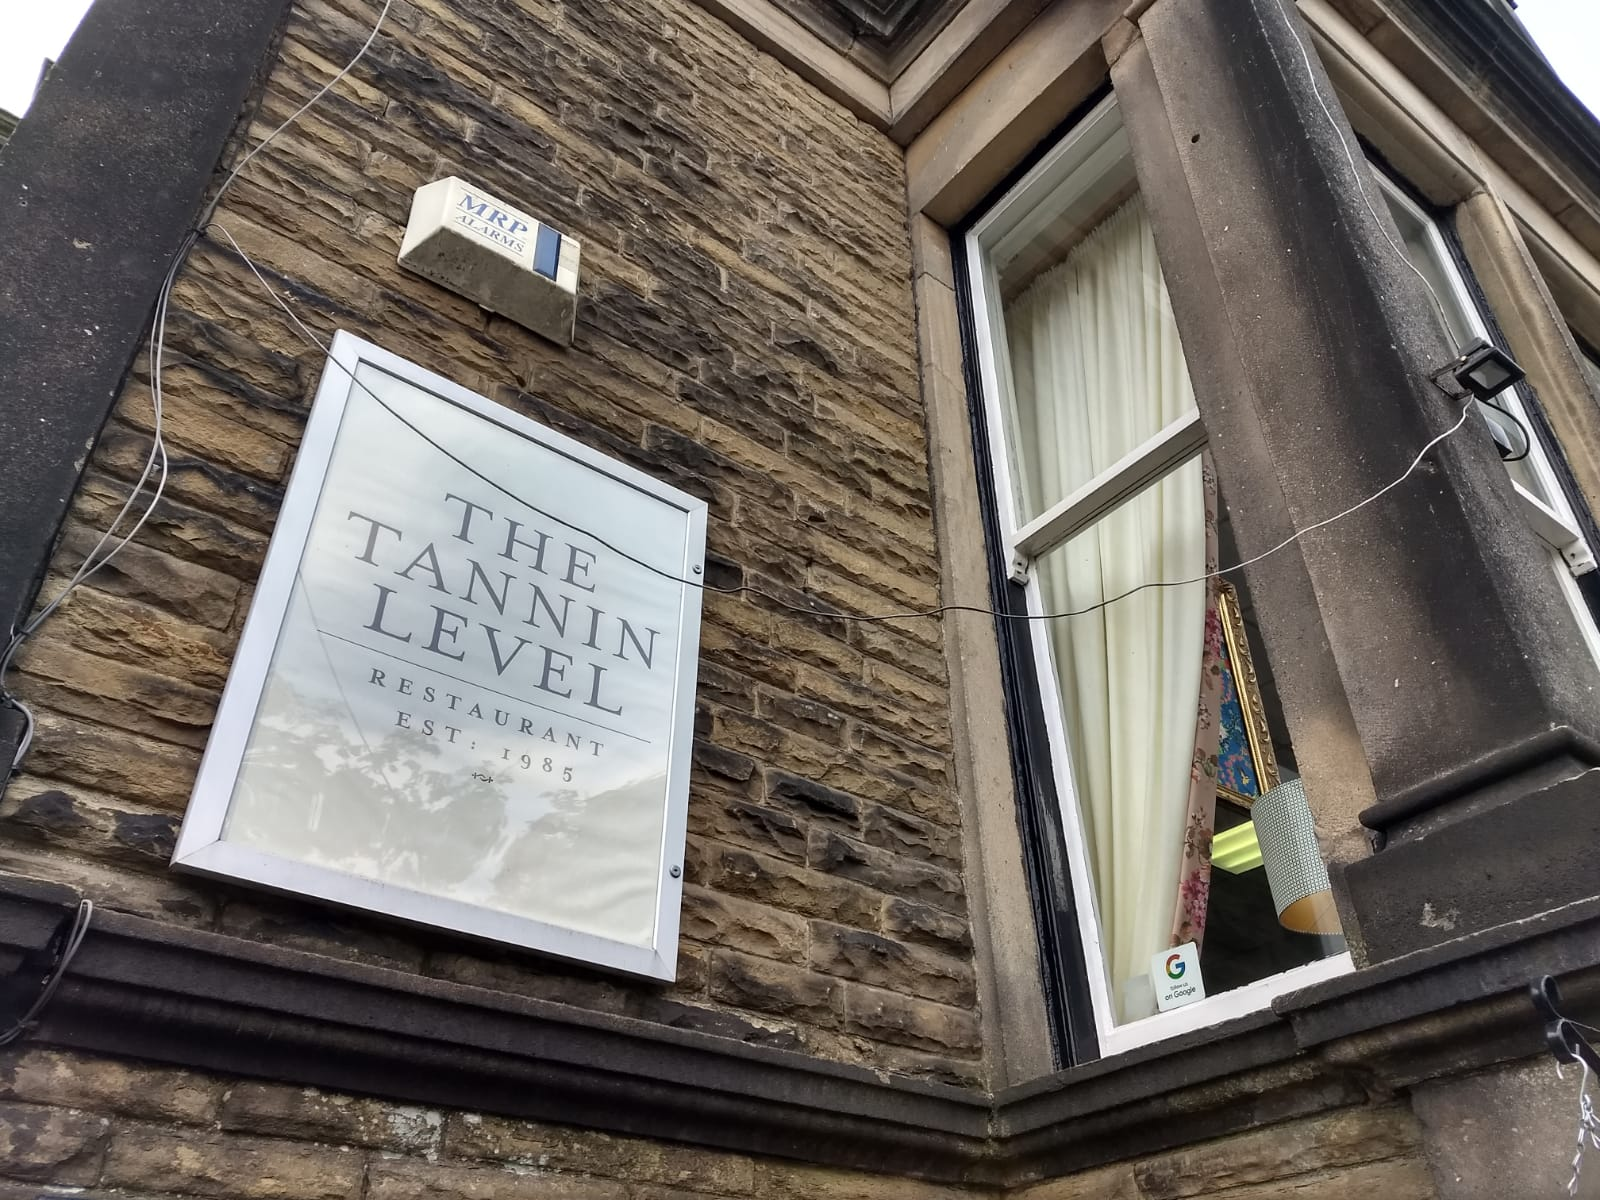 The Tannin Level – Staggering Dining, Harrogate